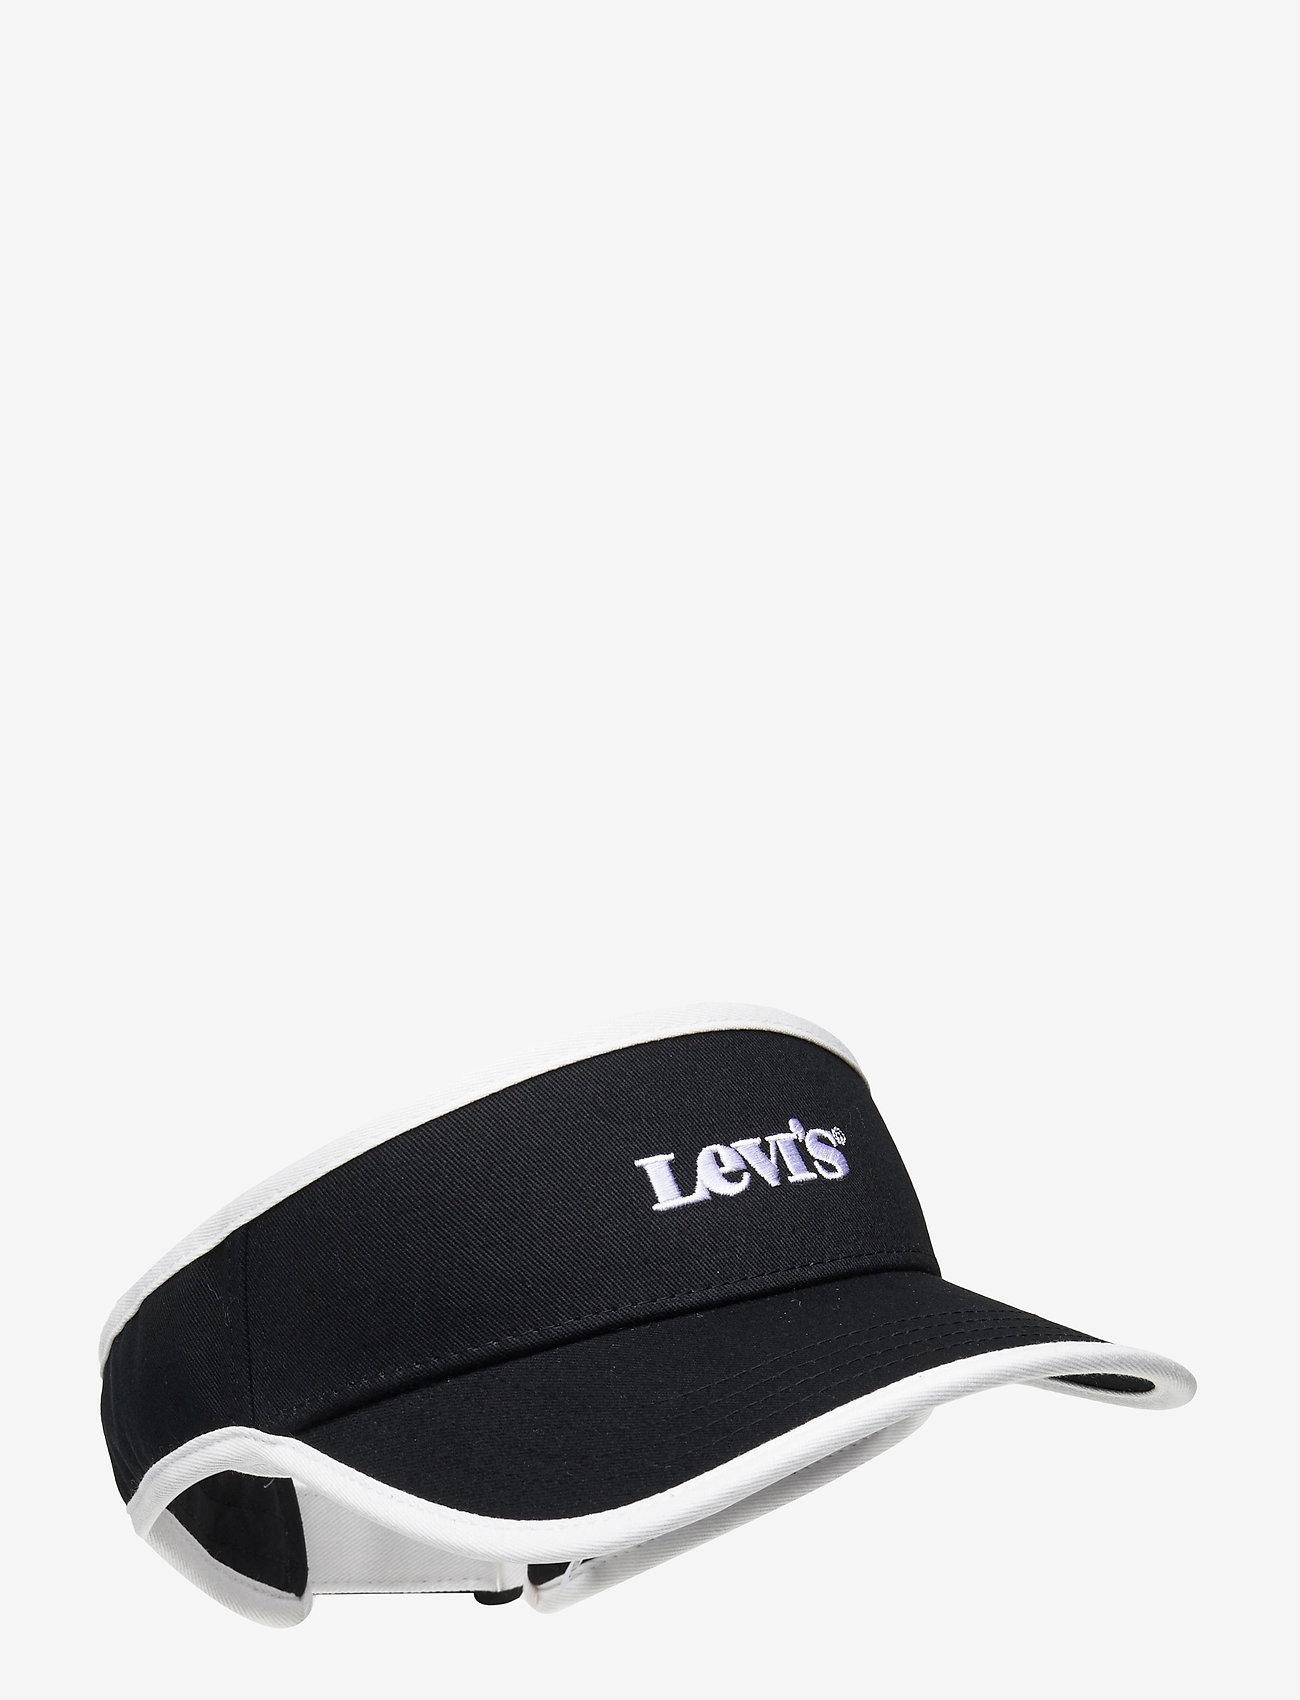 Levi's Footwear & Acc - Visor Cap - Vintage Modern Logo - casquettes - regular black - 0